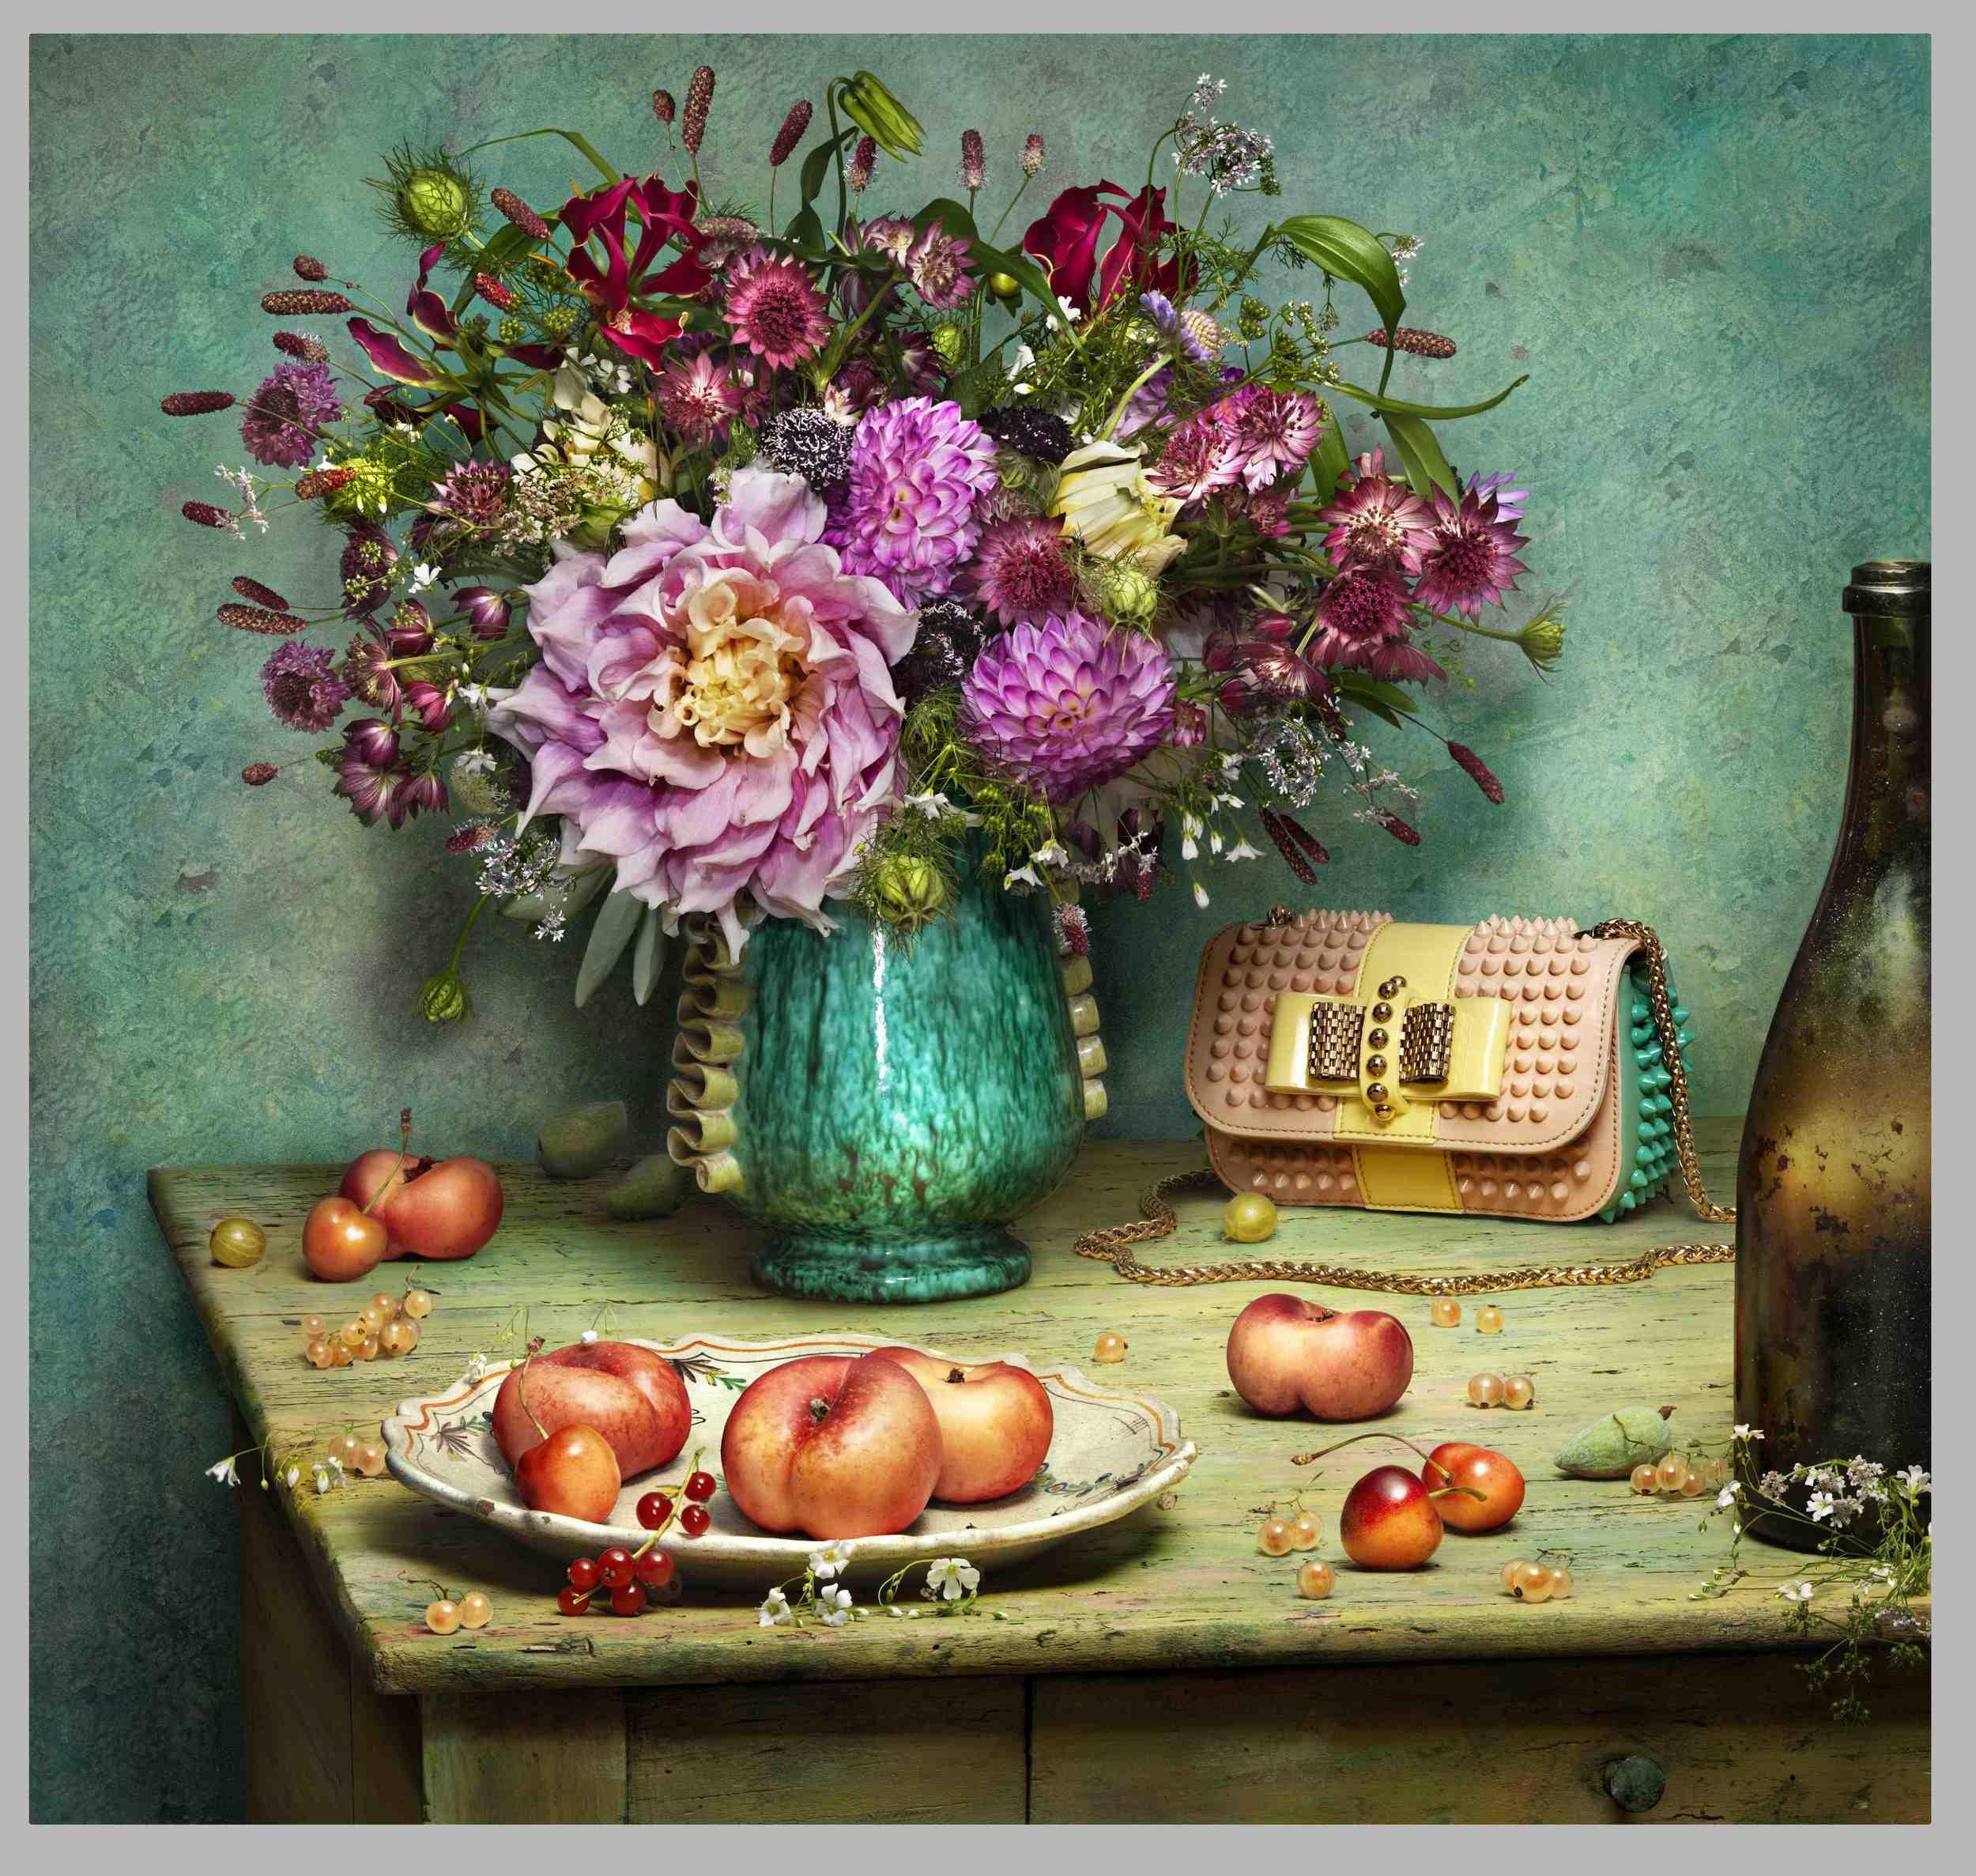 SS14 Louboutin Look Books Cezanne _ Photographer Peter Lippman.jpg